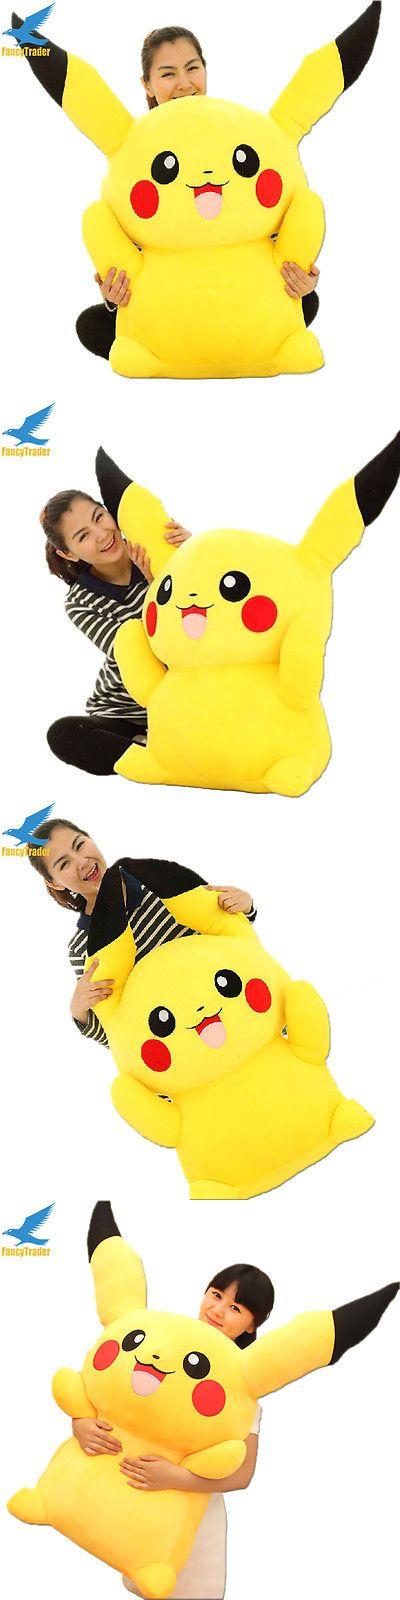 Stuffed Animals Beanbag Plush 51030: Giant Big Hung Plush Pikachu Soft Toys Stuffed Filled Doll Kids Girls Best Gift -> BUY IT NOW ONLY: $42.99 on eBay!